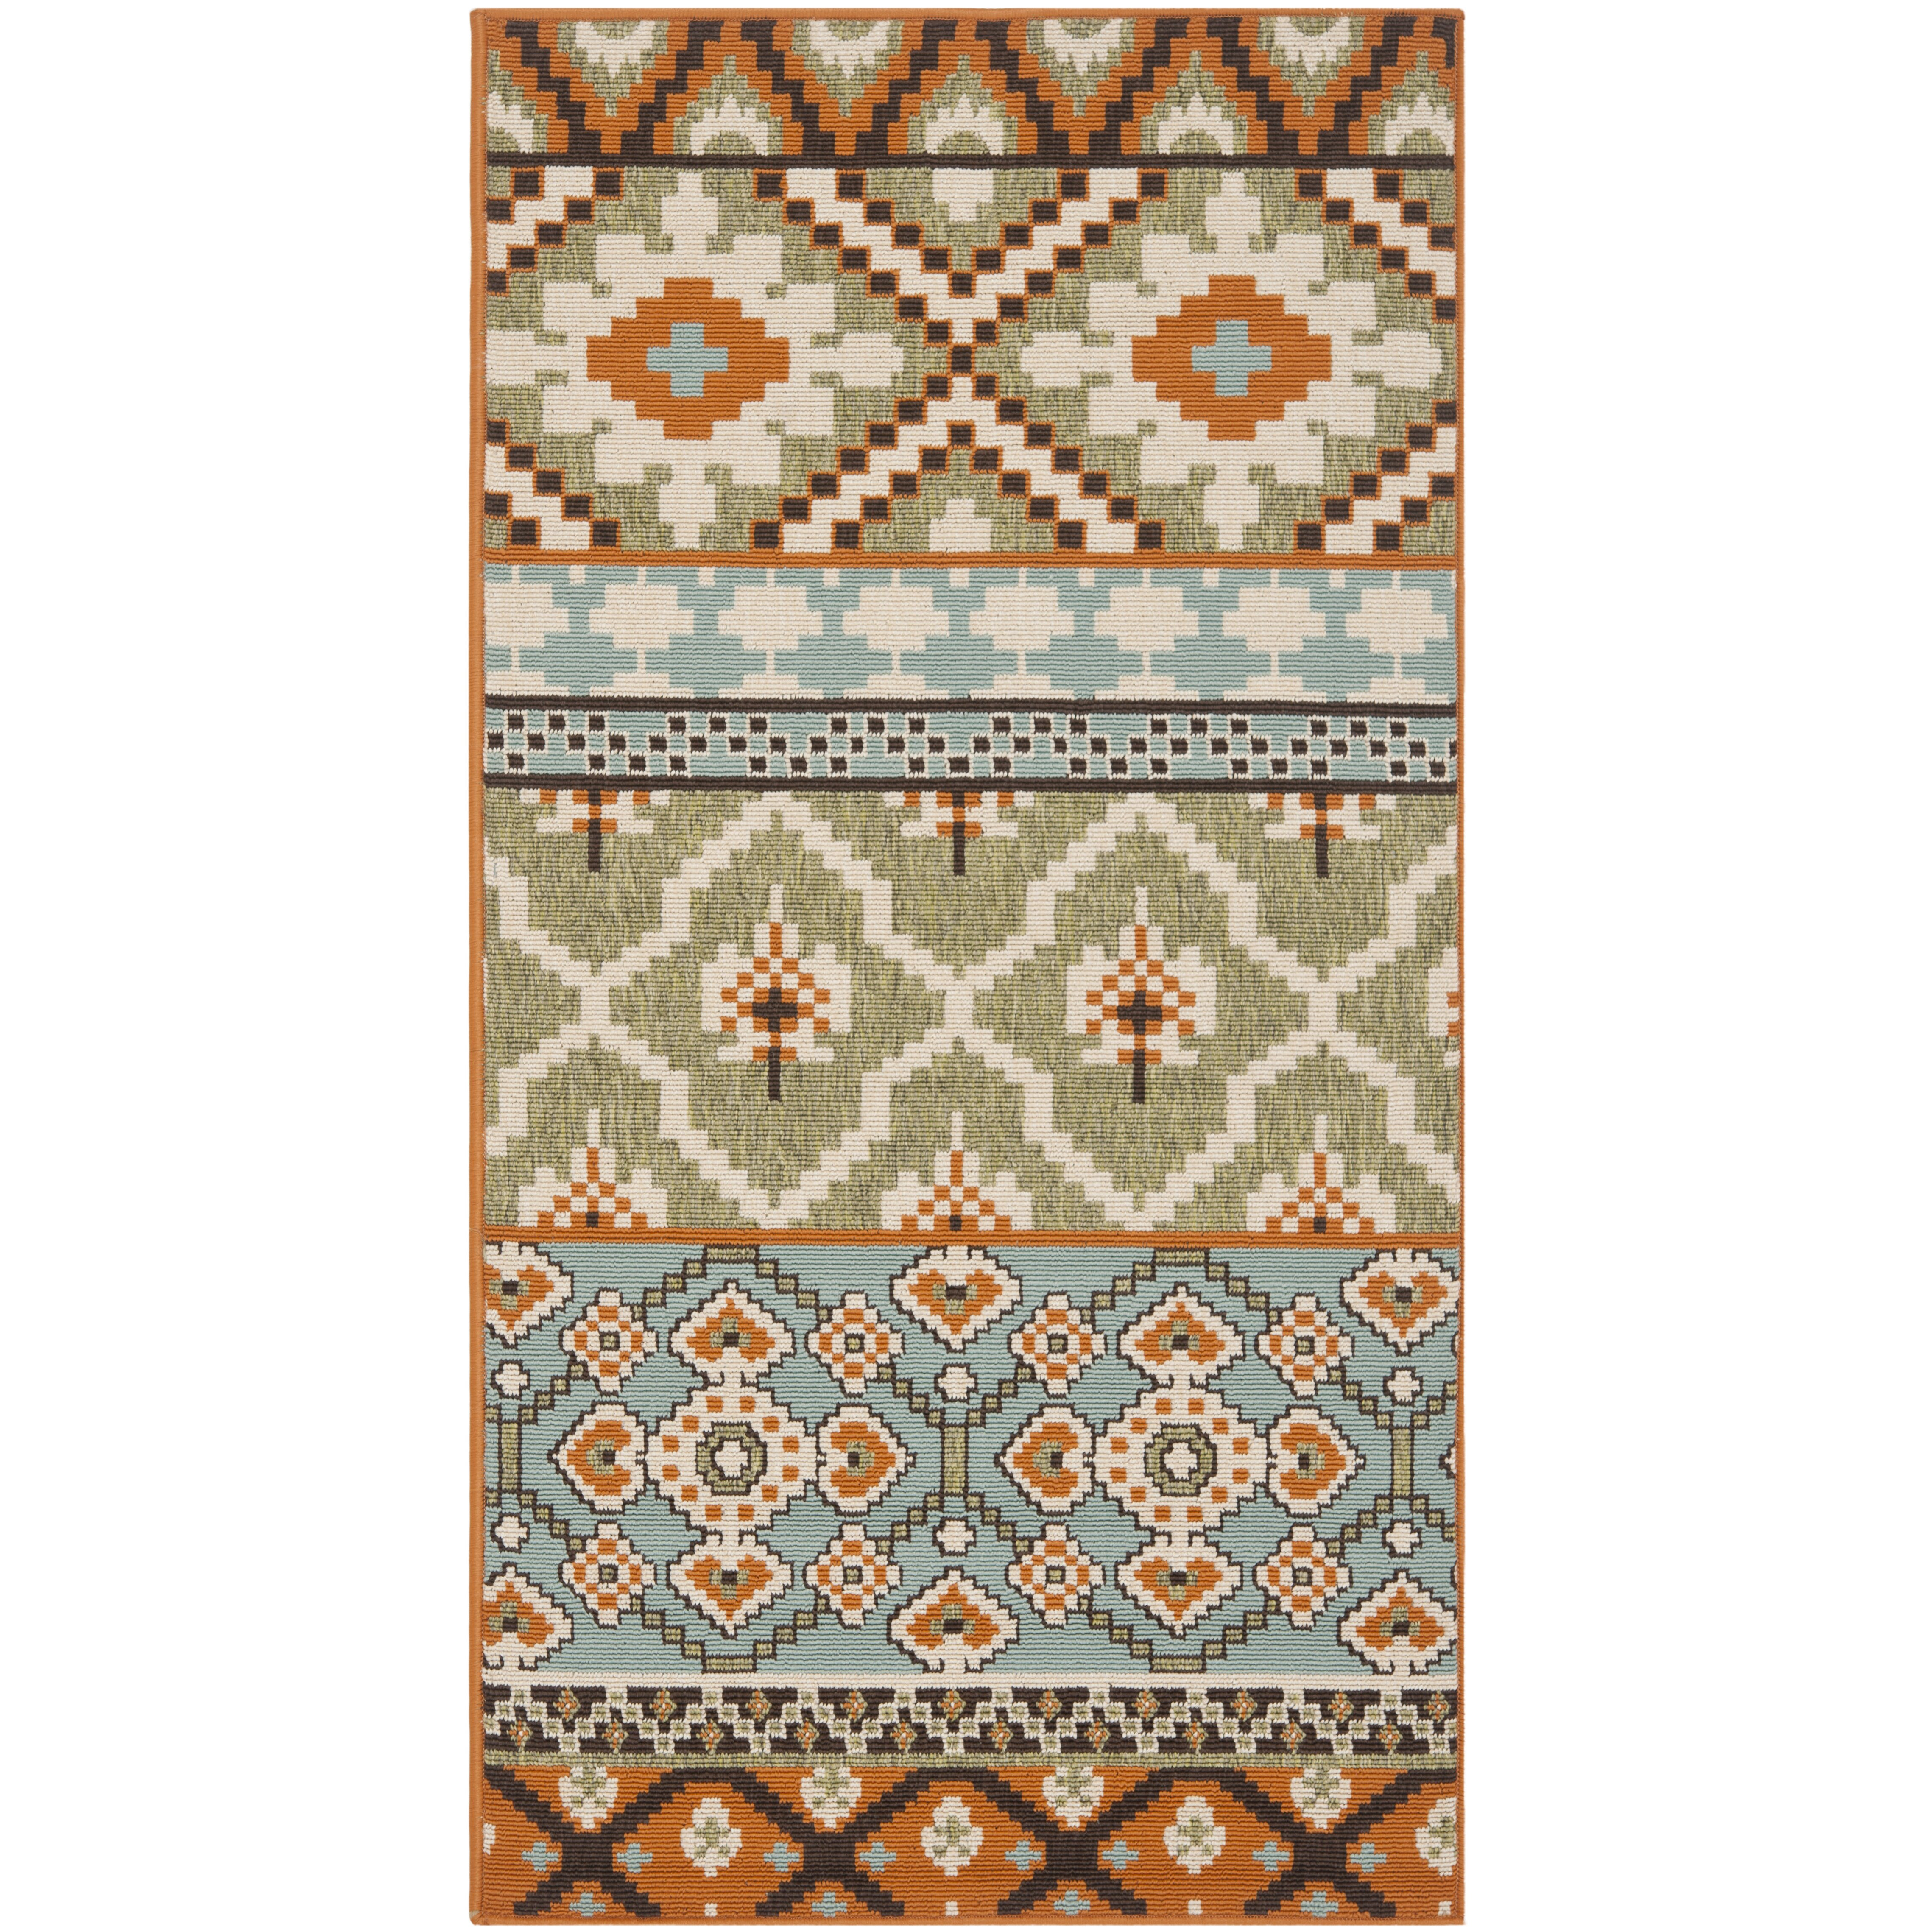 Area Rugs Wayfair: Safavieh Veranda Green/Terracotta Area Rug & Reviews